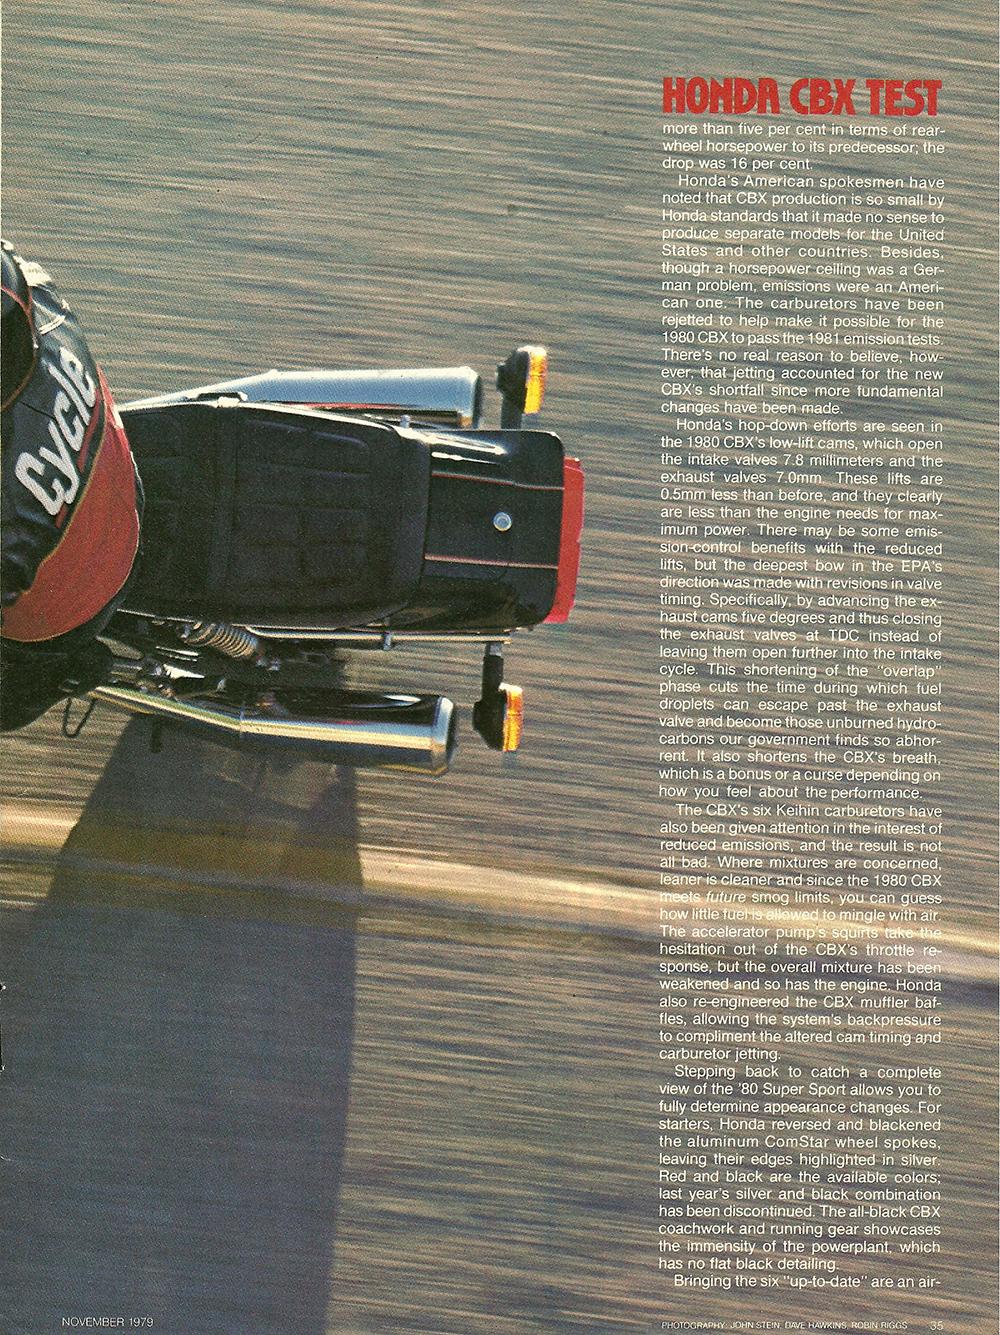 1979 Honda CBX road test 04.jpg